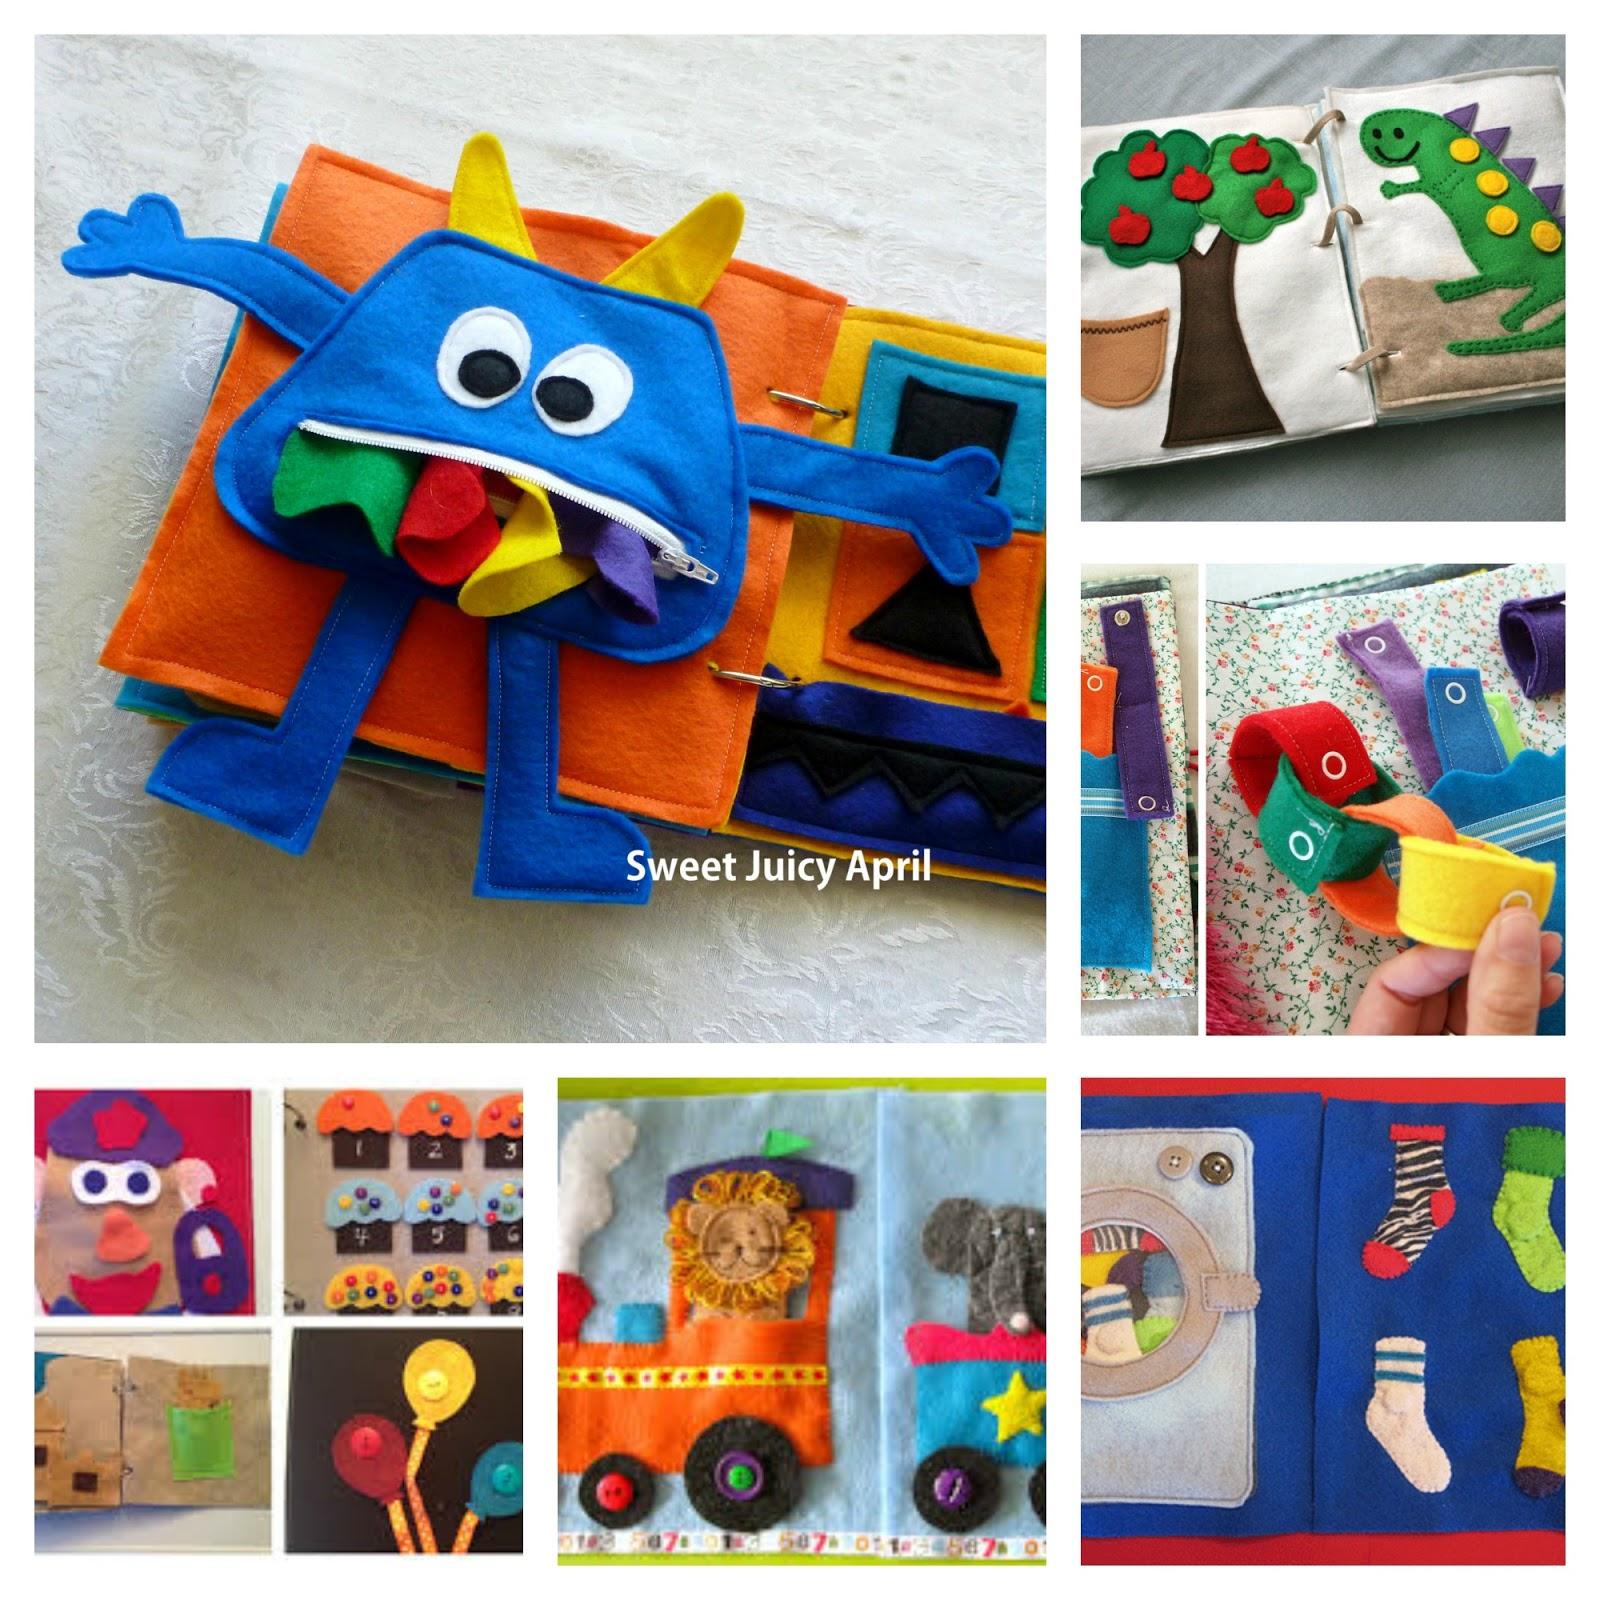 libros sensoriales para ninos de 0 a 3 anos